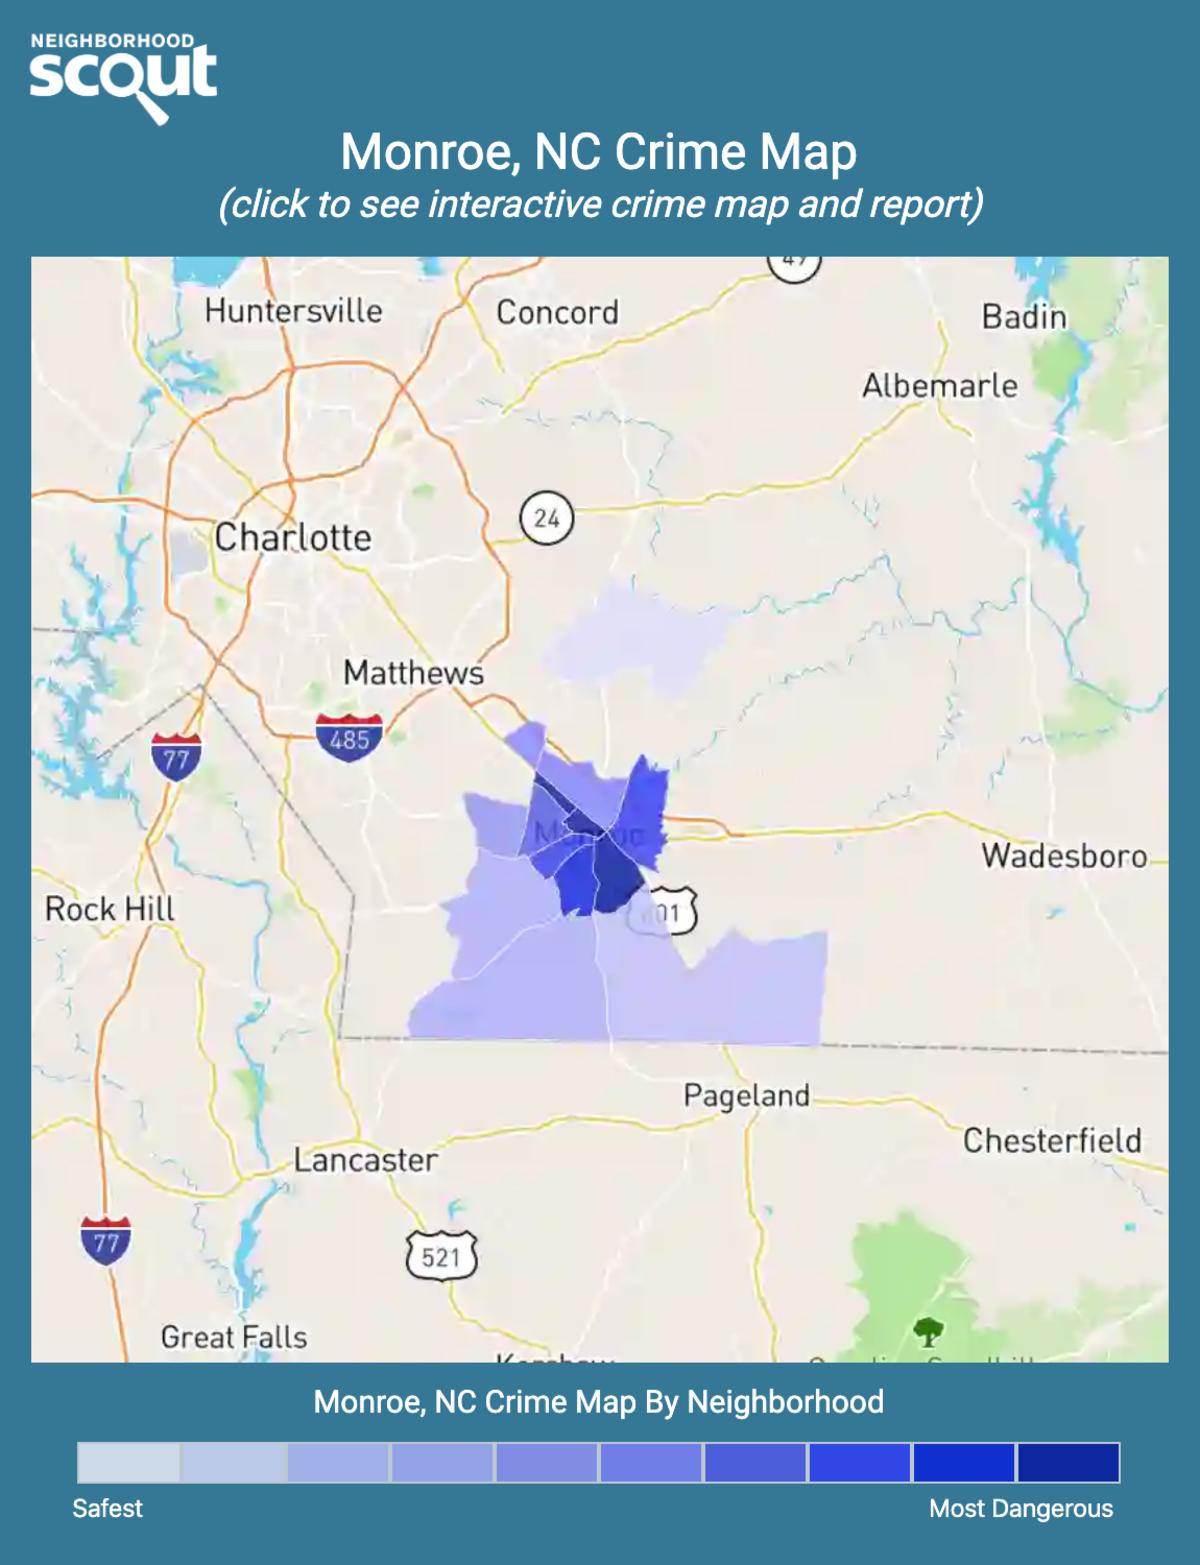 Monroe, North Carolina crime map